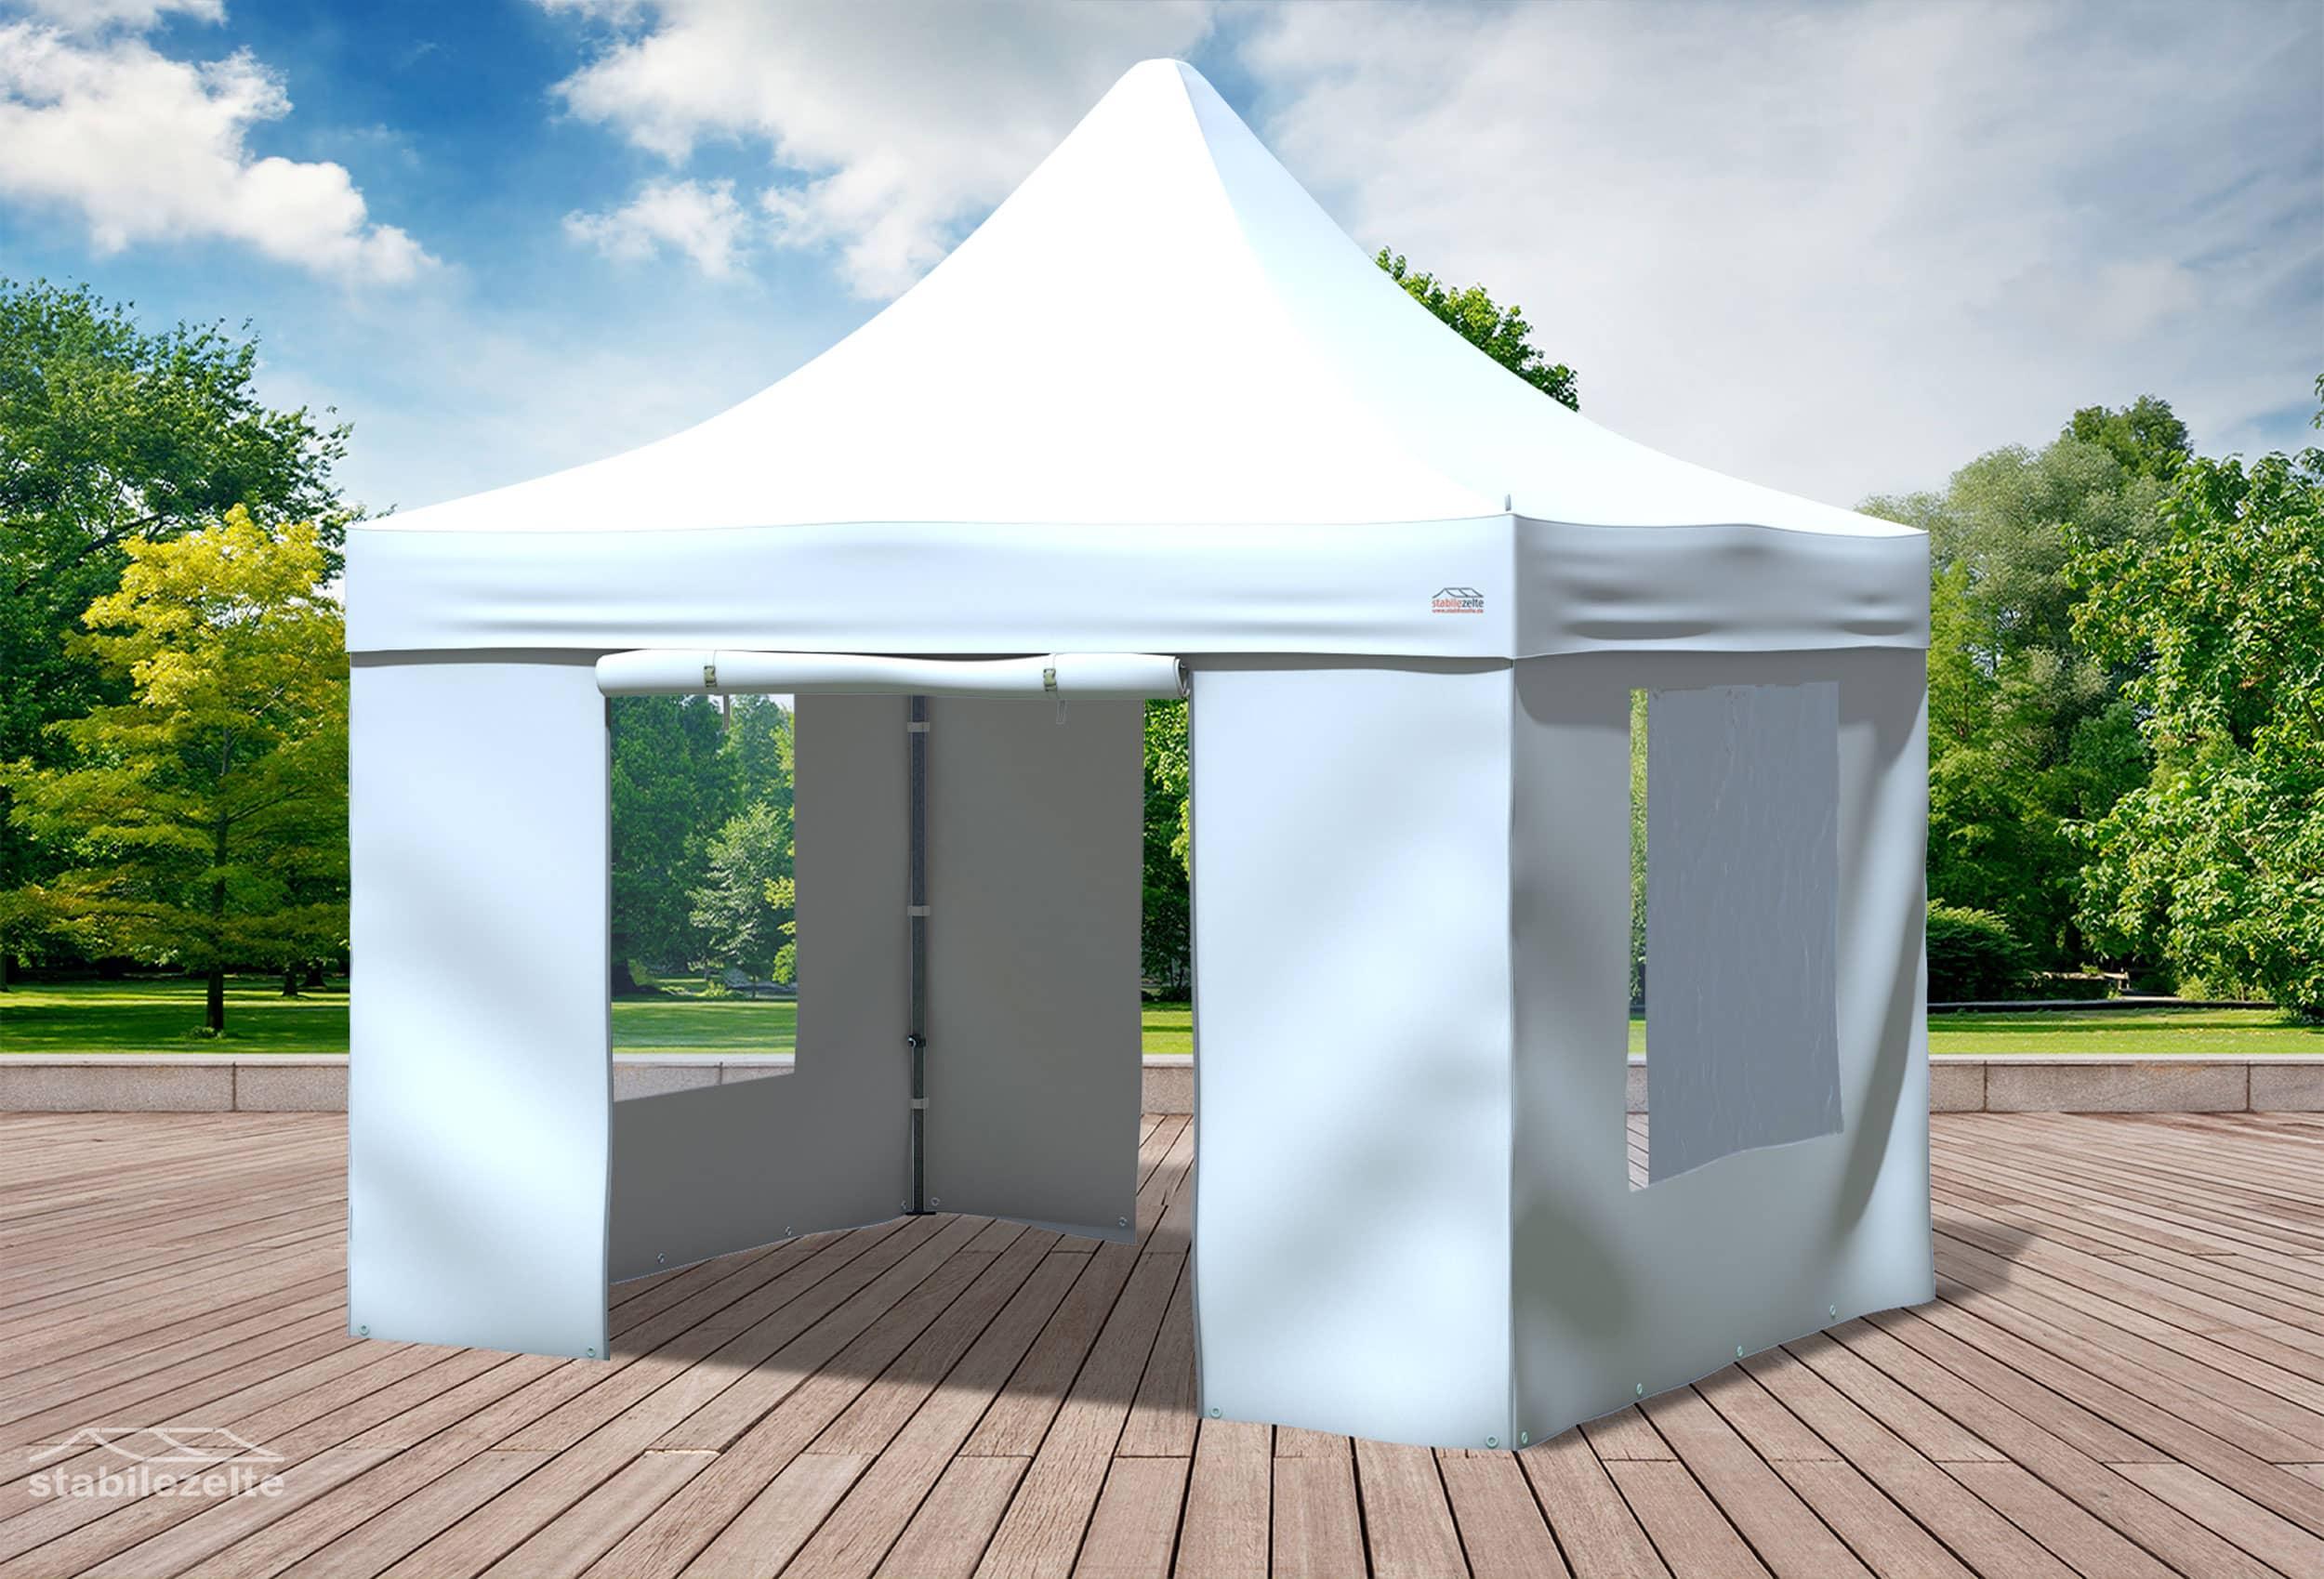 3x3 m faltpavillon wei premium serie faltpavillons. Black Bedroom Furniture Sets. Home Design Ideas